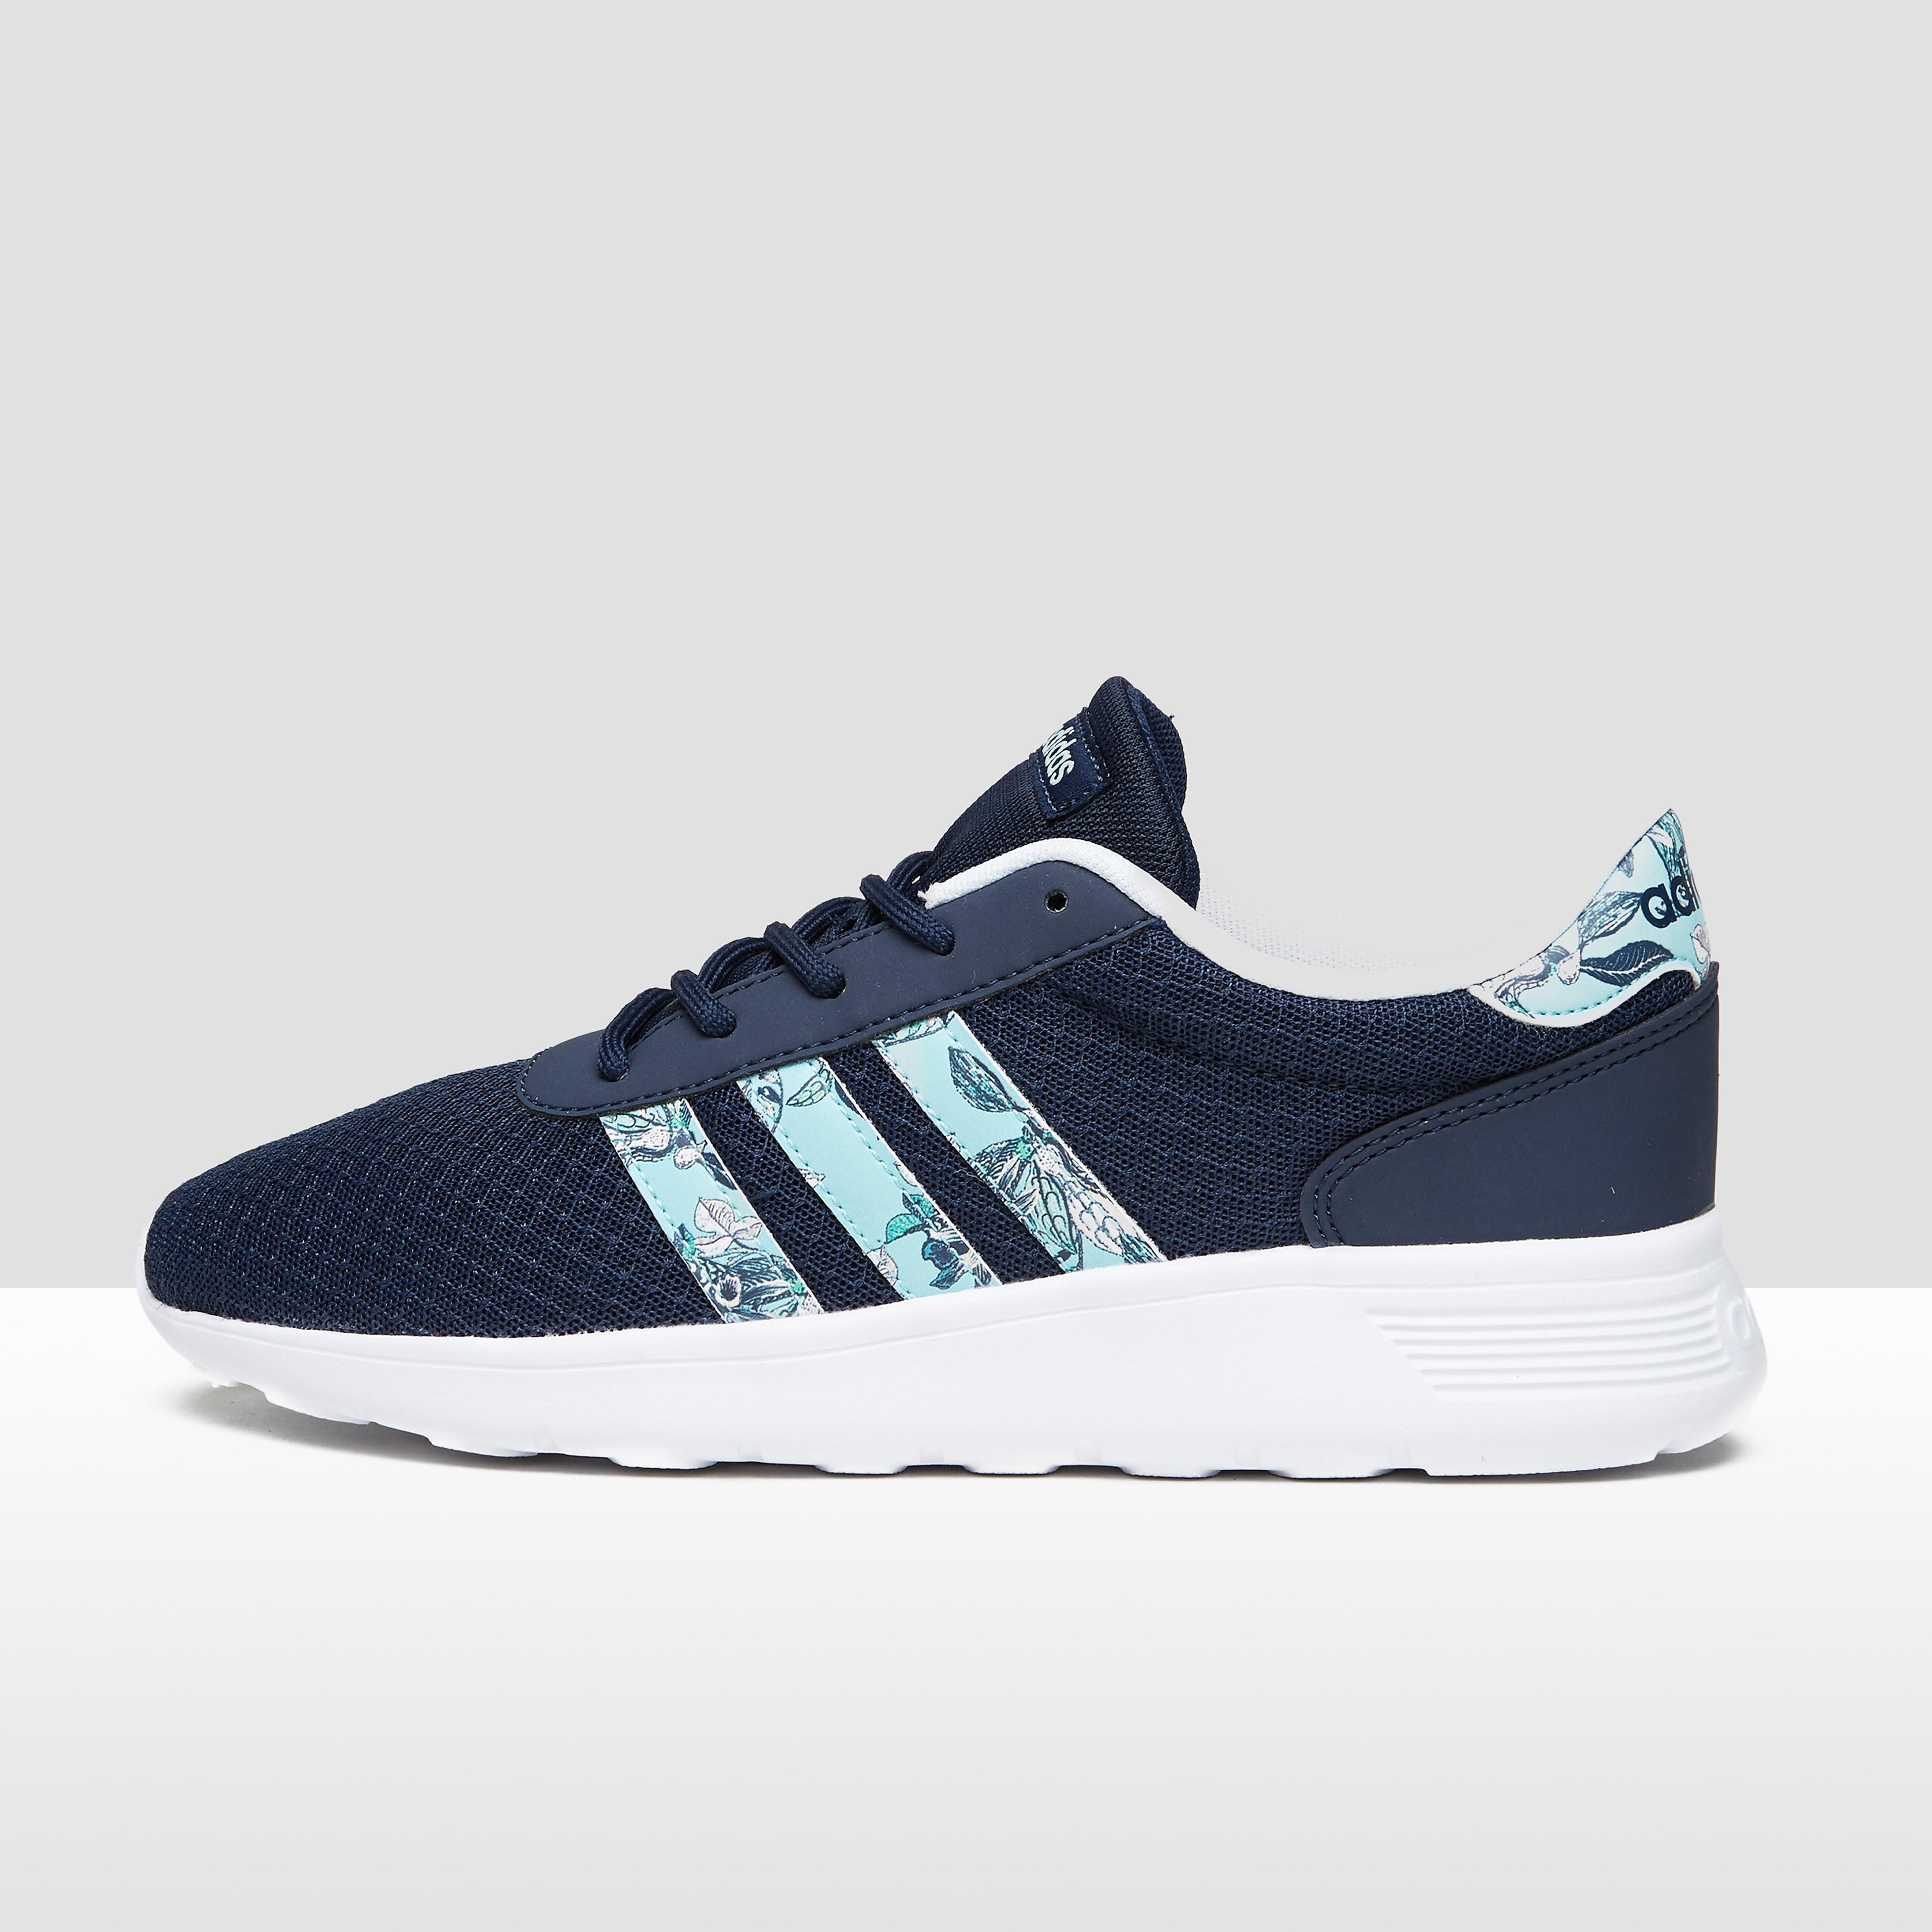 Adidas Lite Racer damessneaker blauw